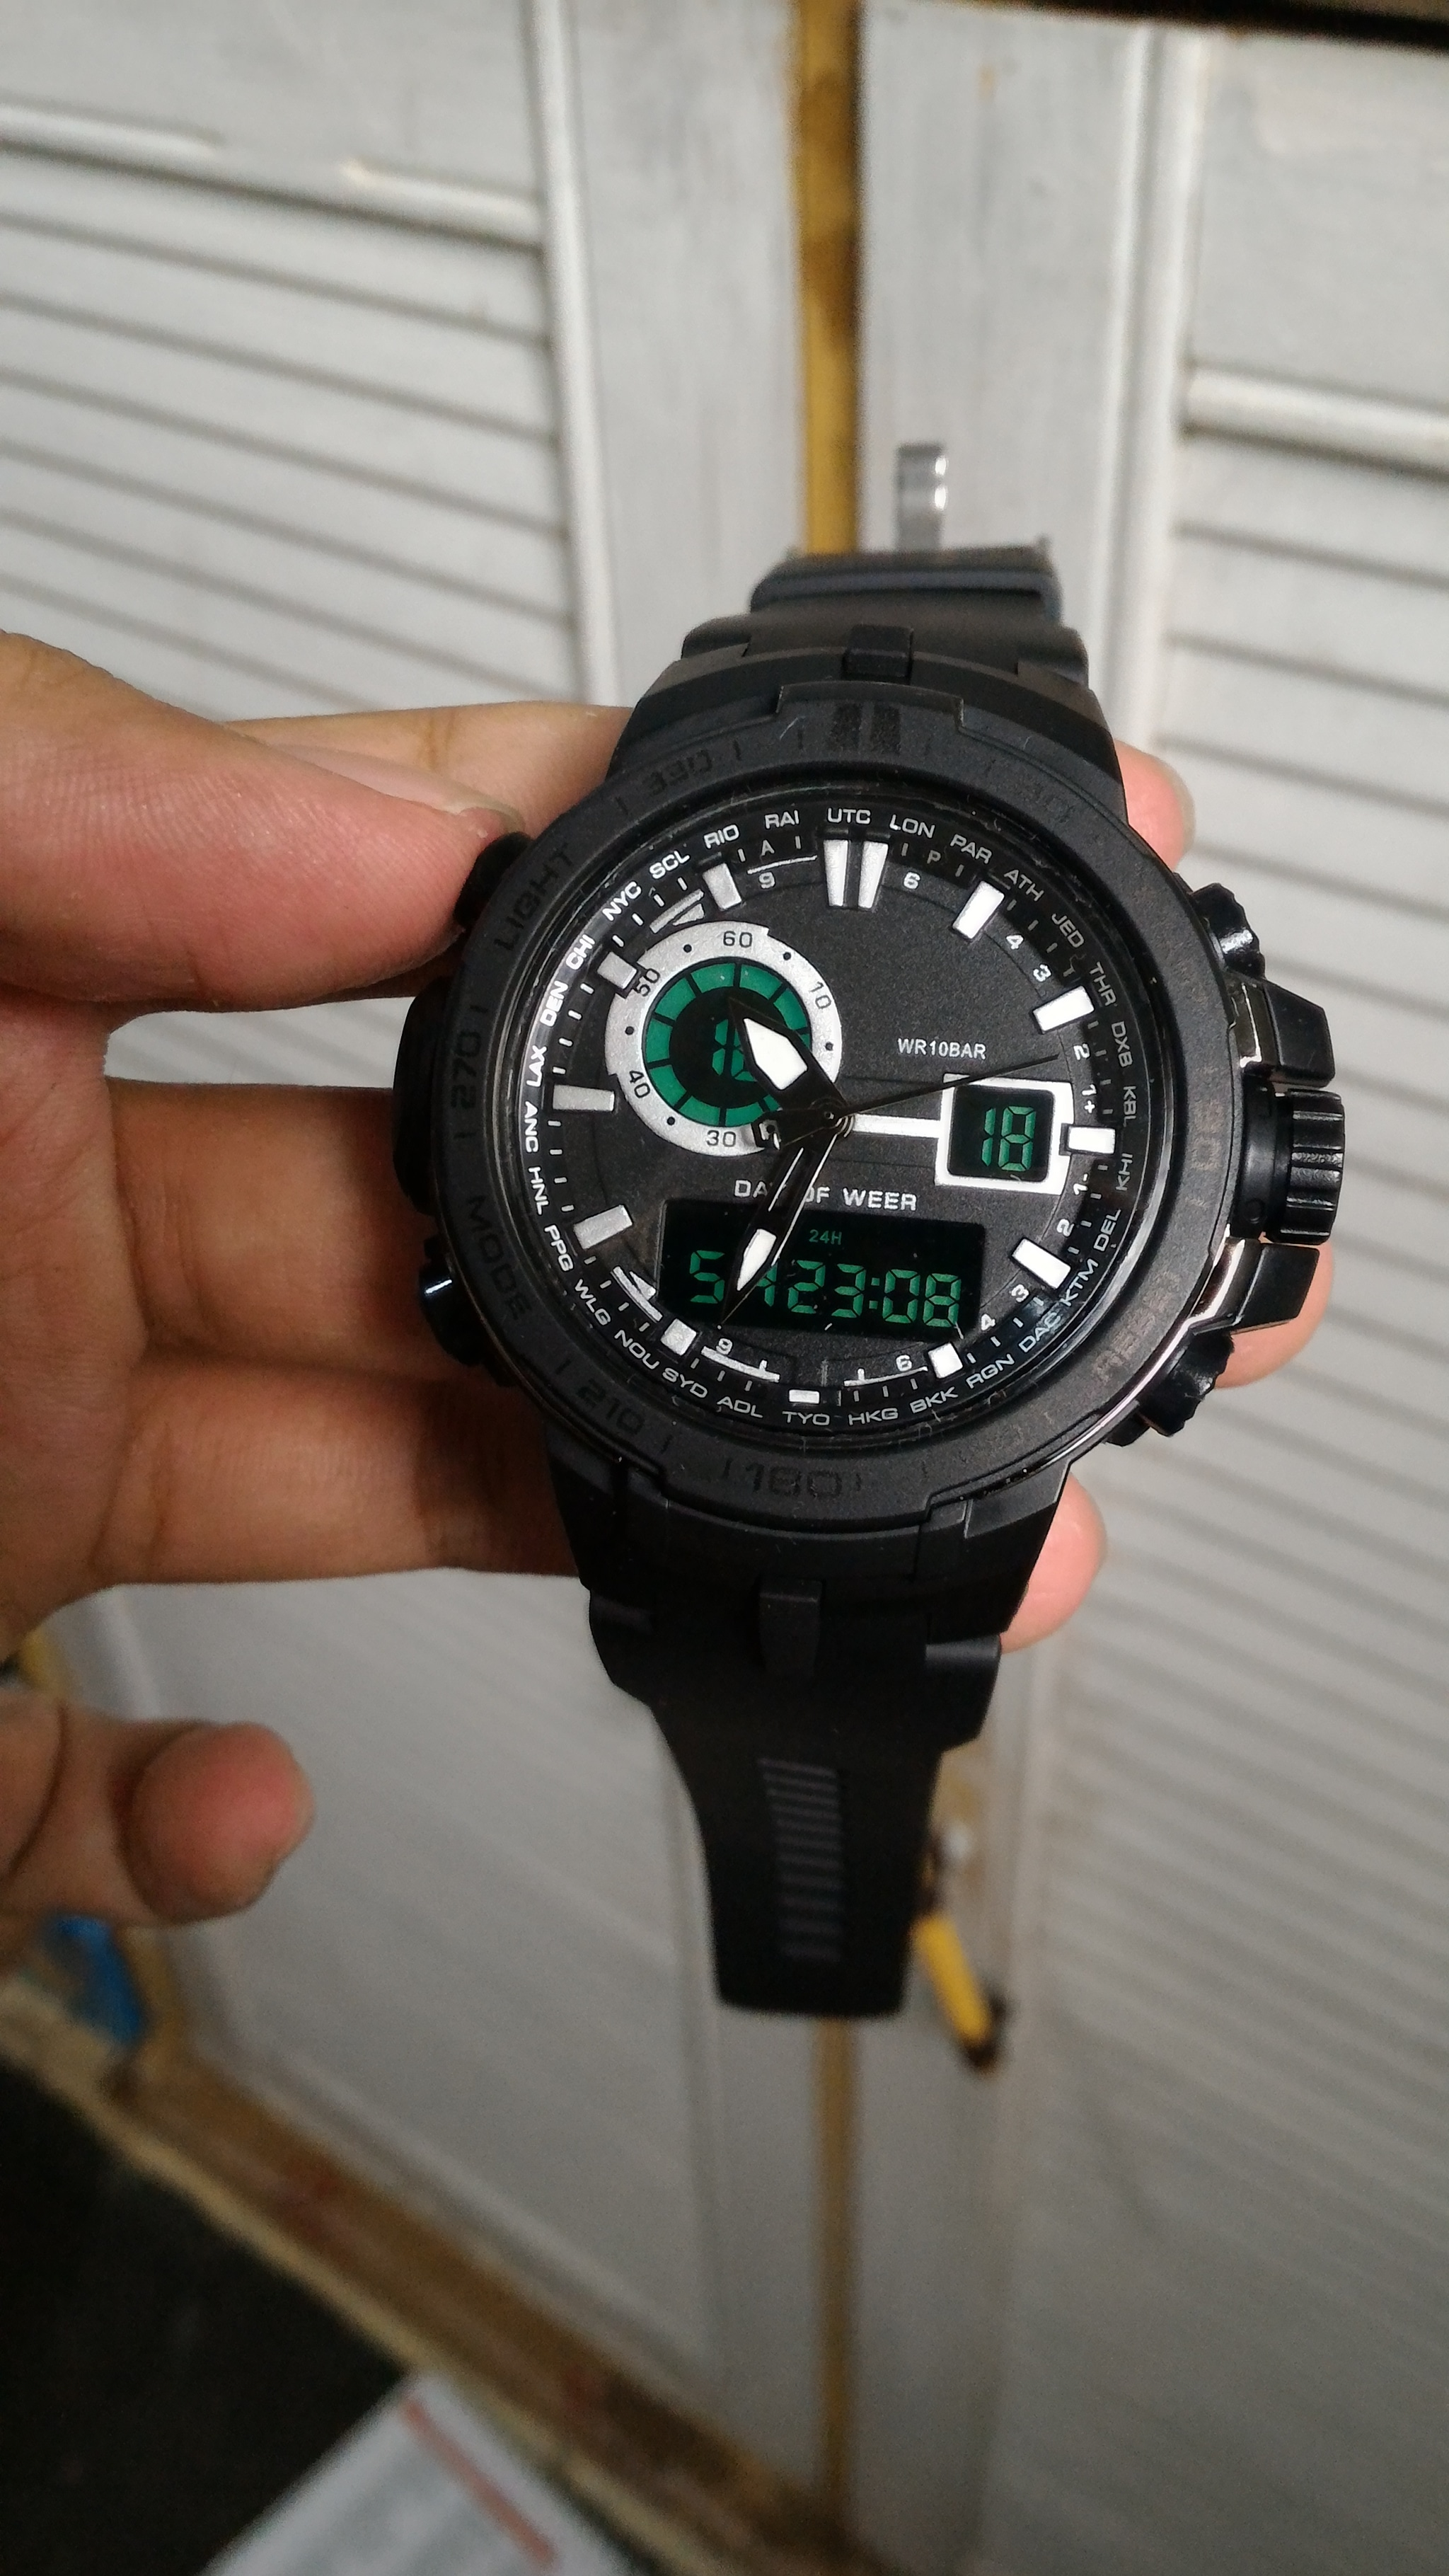 G-shock Protrek PRW6000 hitam